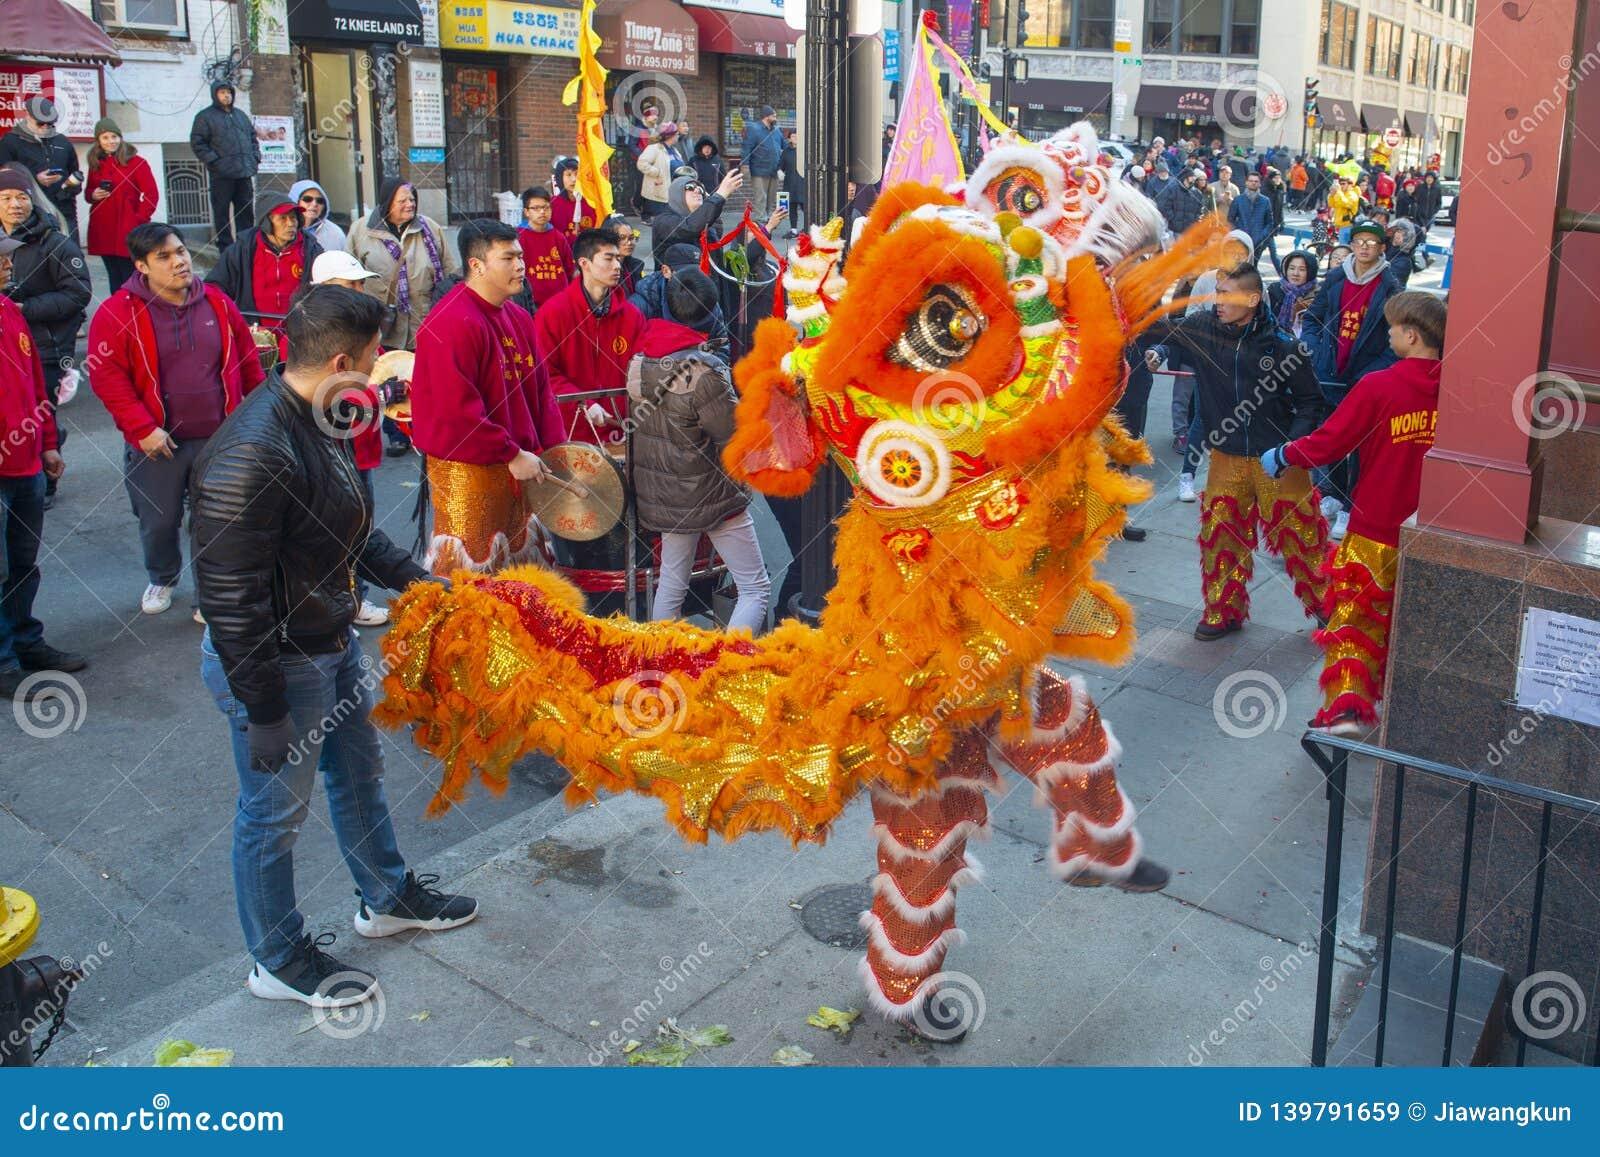 Lion Dance in Chinatown Boston, Massachusetts, U.S.A.